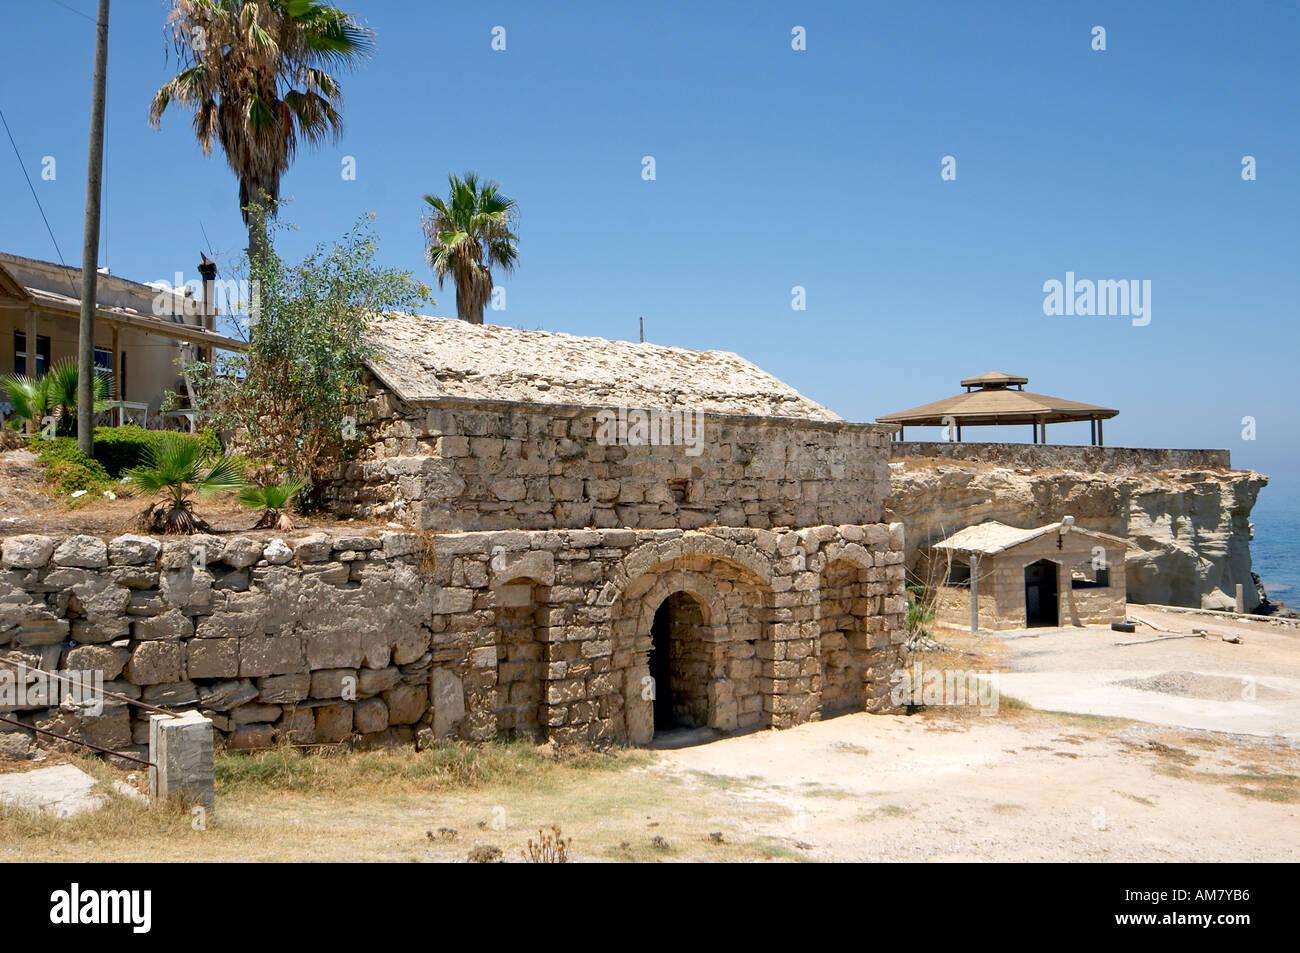 Agios Thyrsos Agiasmos well Karpas Peninsula Northern Cyprus Stock Photo